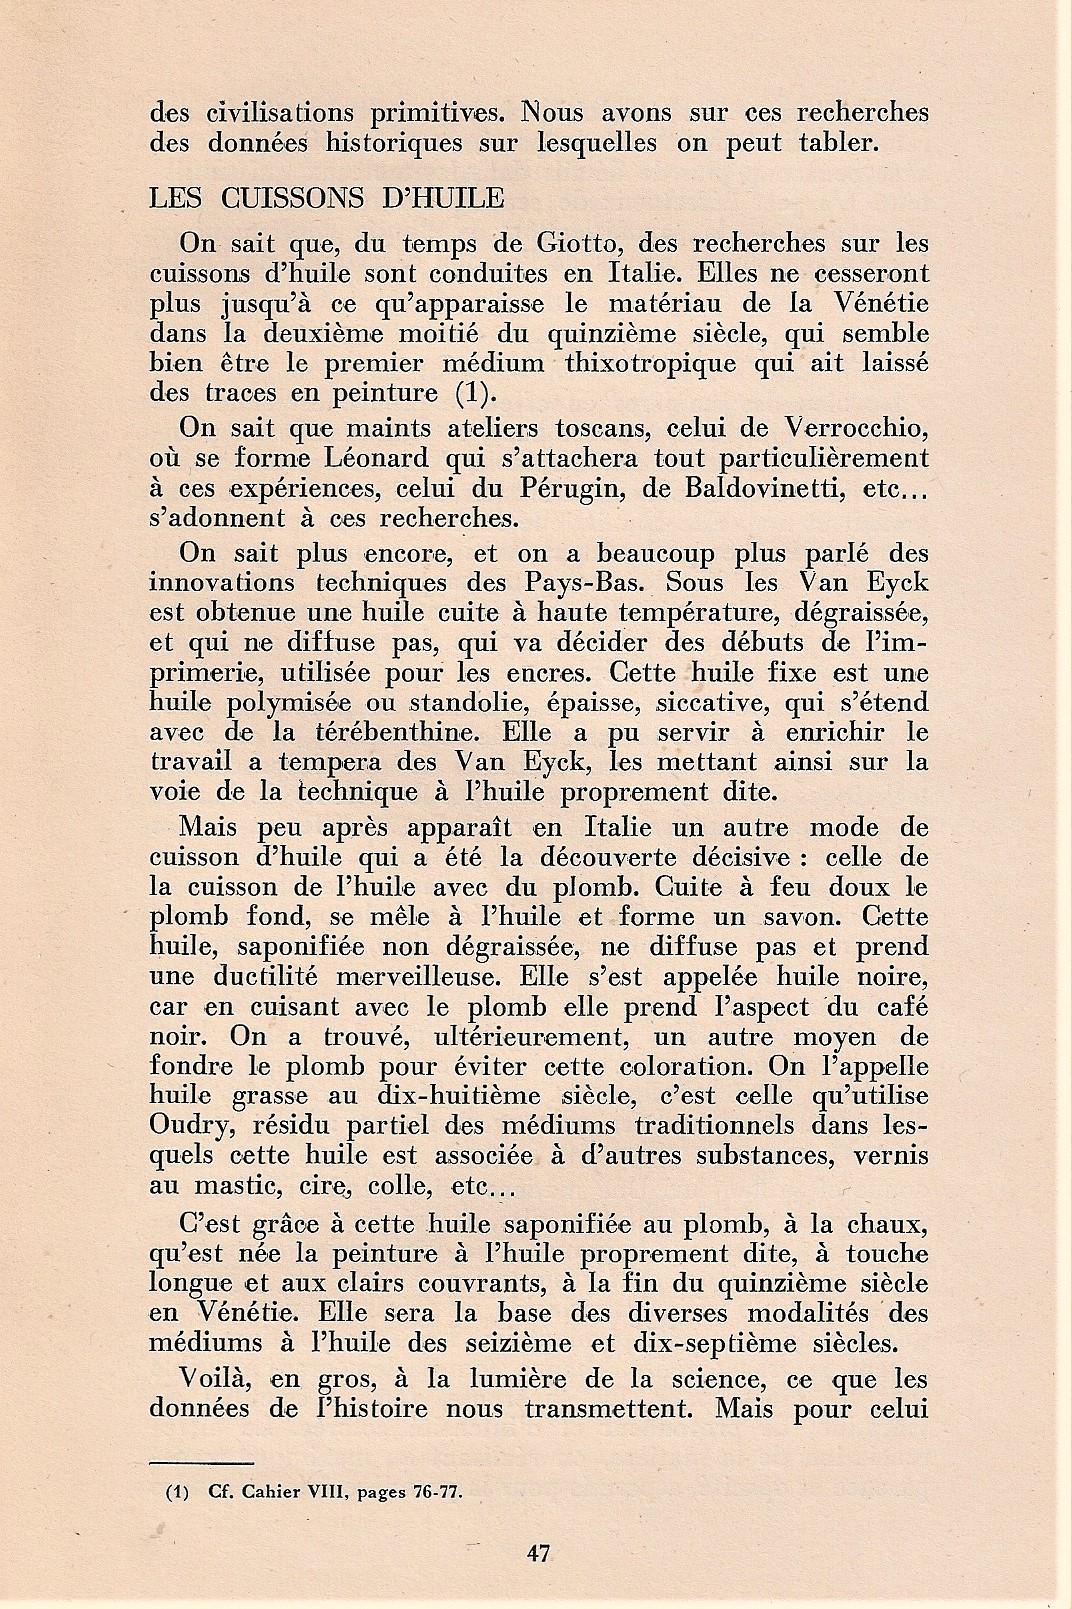 versini-page-47.jpg